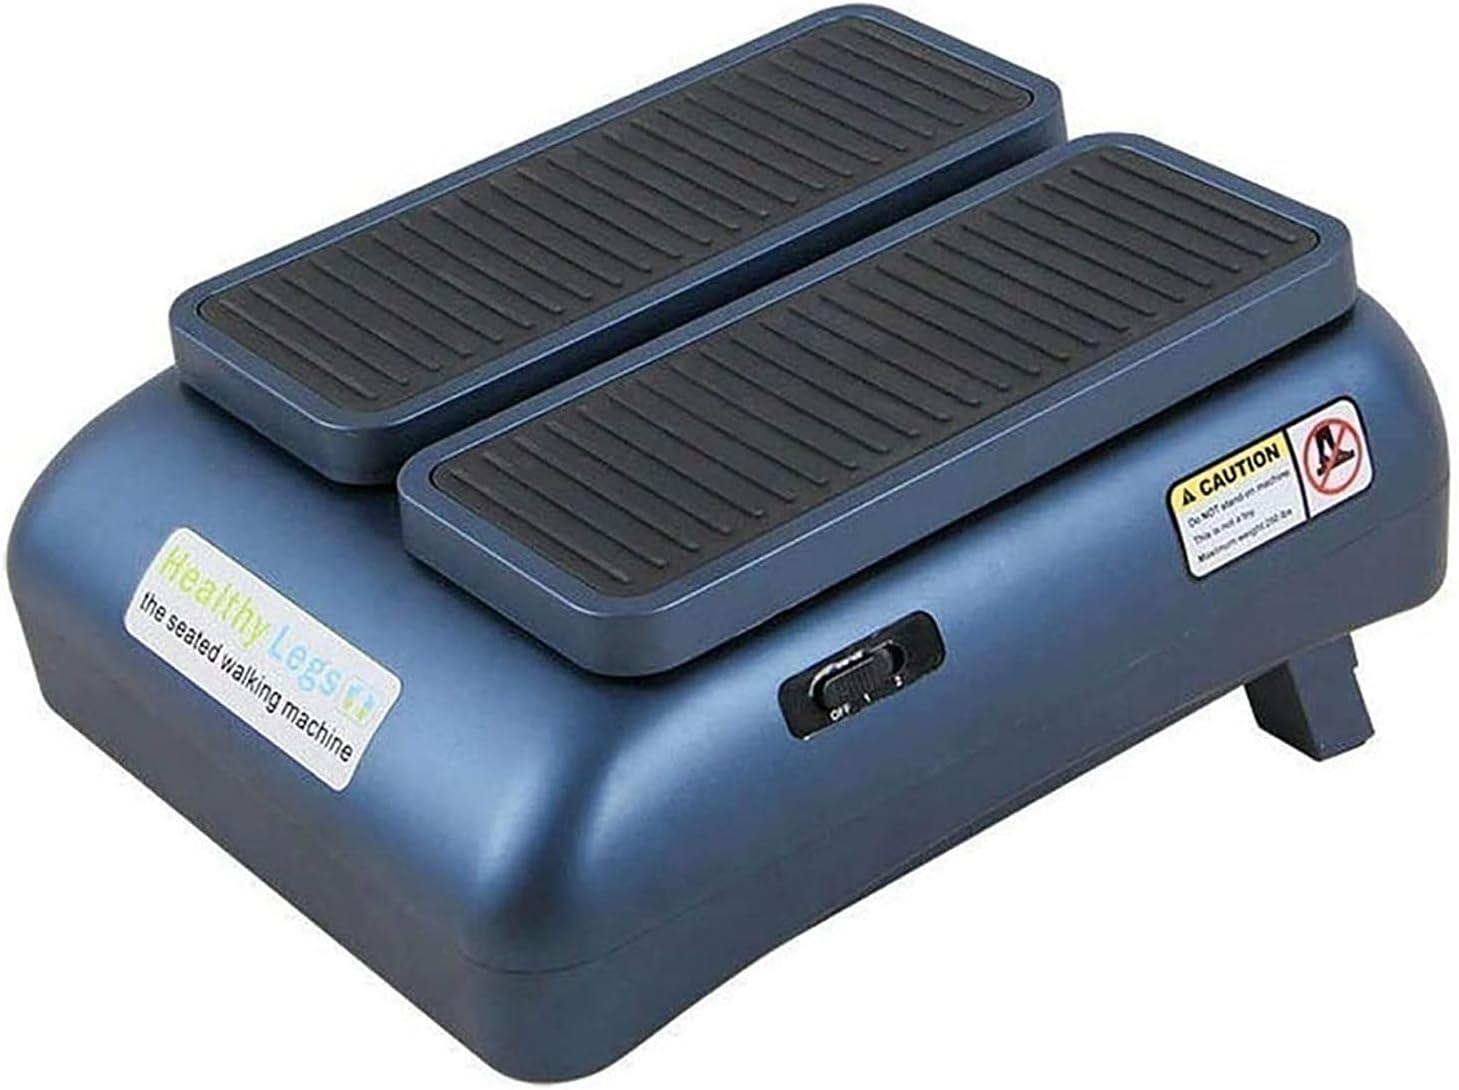 Sales of SALE items from new works joyvio Ergonomic Design Super sale - Circulation Exerci Exerciser Leg